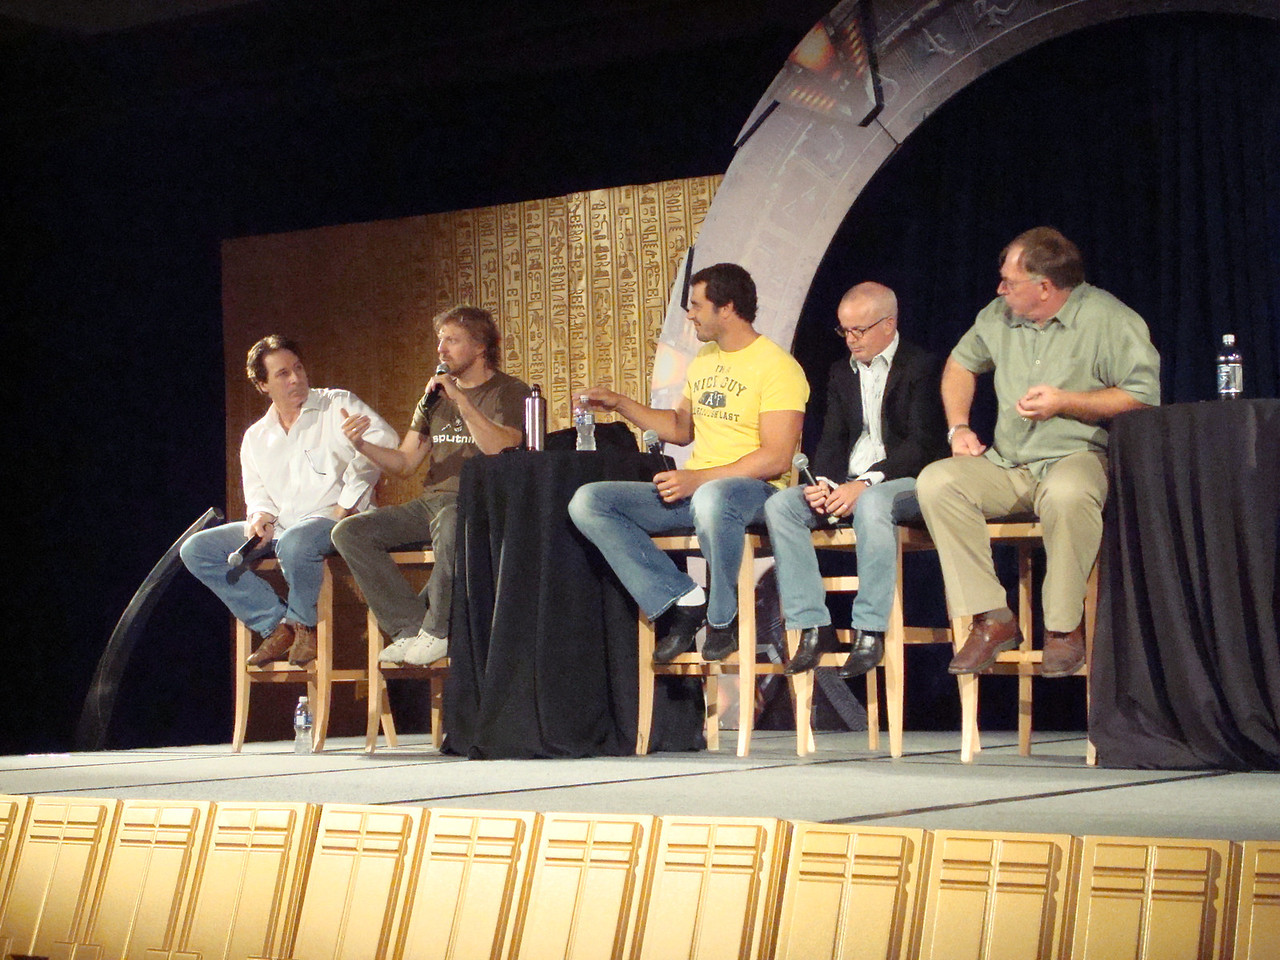 Garwin Sanford (Narim, Simon Wallis), Alex Zahara (a bunch of different Stargate characters), Dan Payne (Super Soldier, Wraith Warrior), Gary Jones (Sgt. Walter Davis/Harriman), Gary Chalk (Colonel Chekhov)